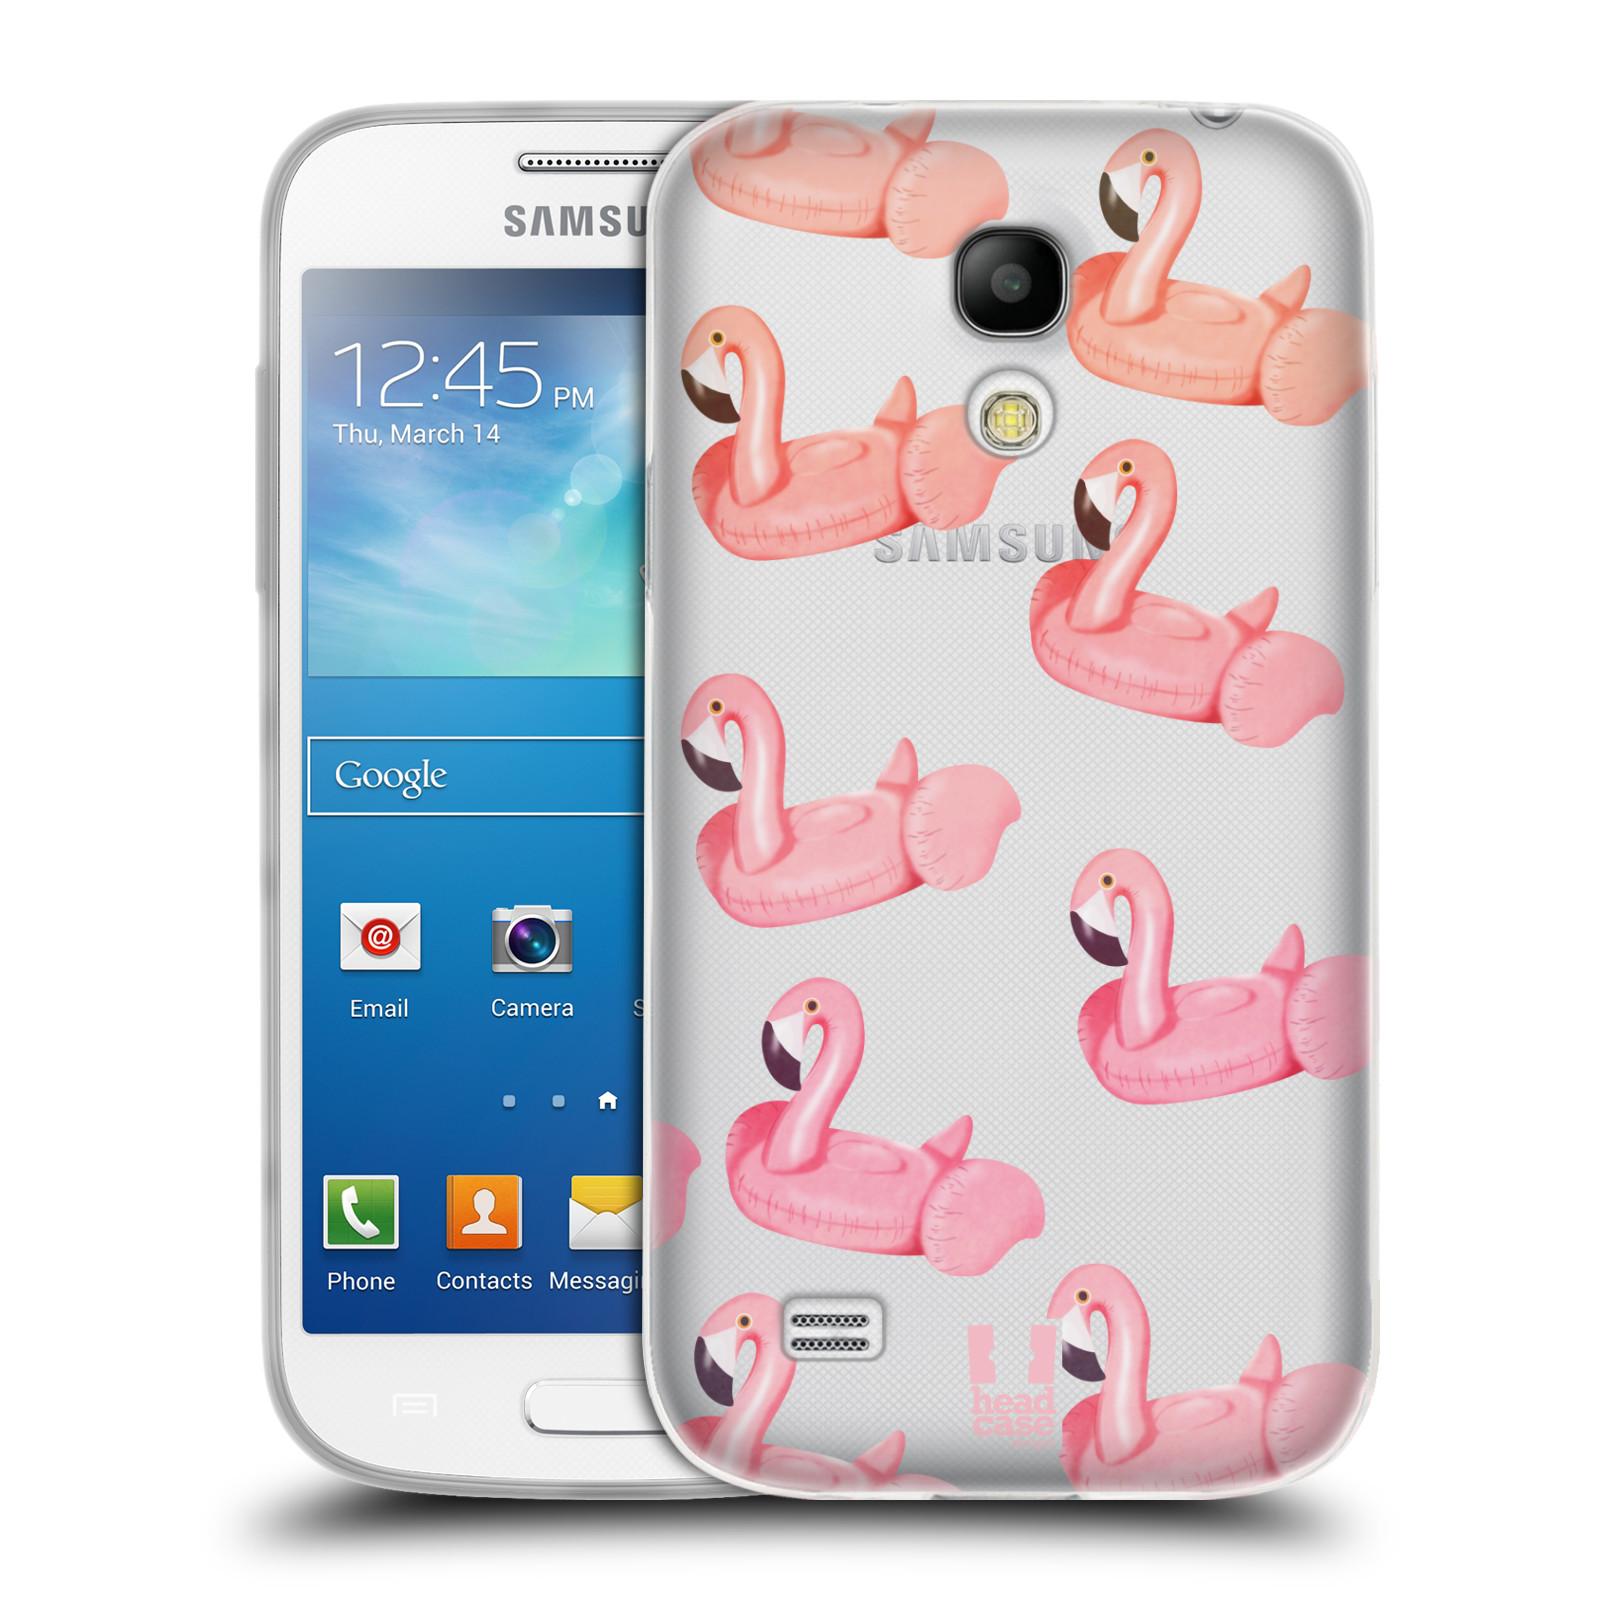 Silikonové pouzdro na mobil Samsung Galaxy S4 Mini VE - Head Case - Kruh plaměňák